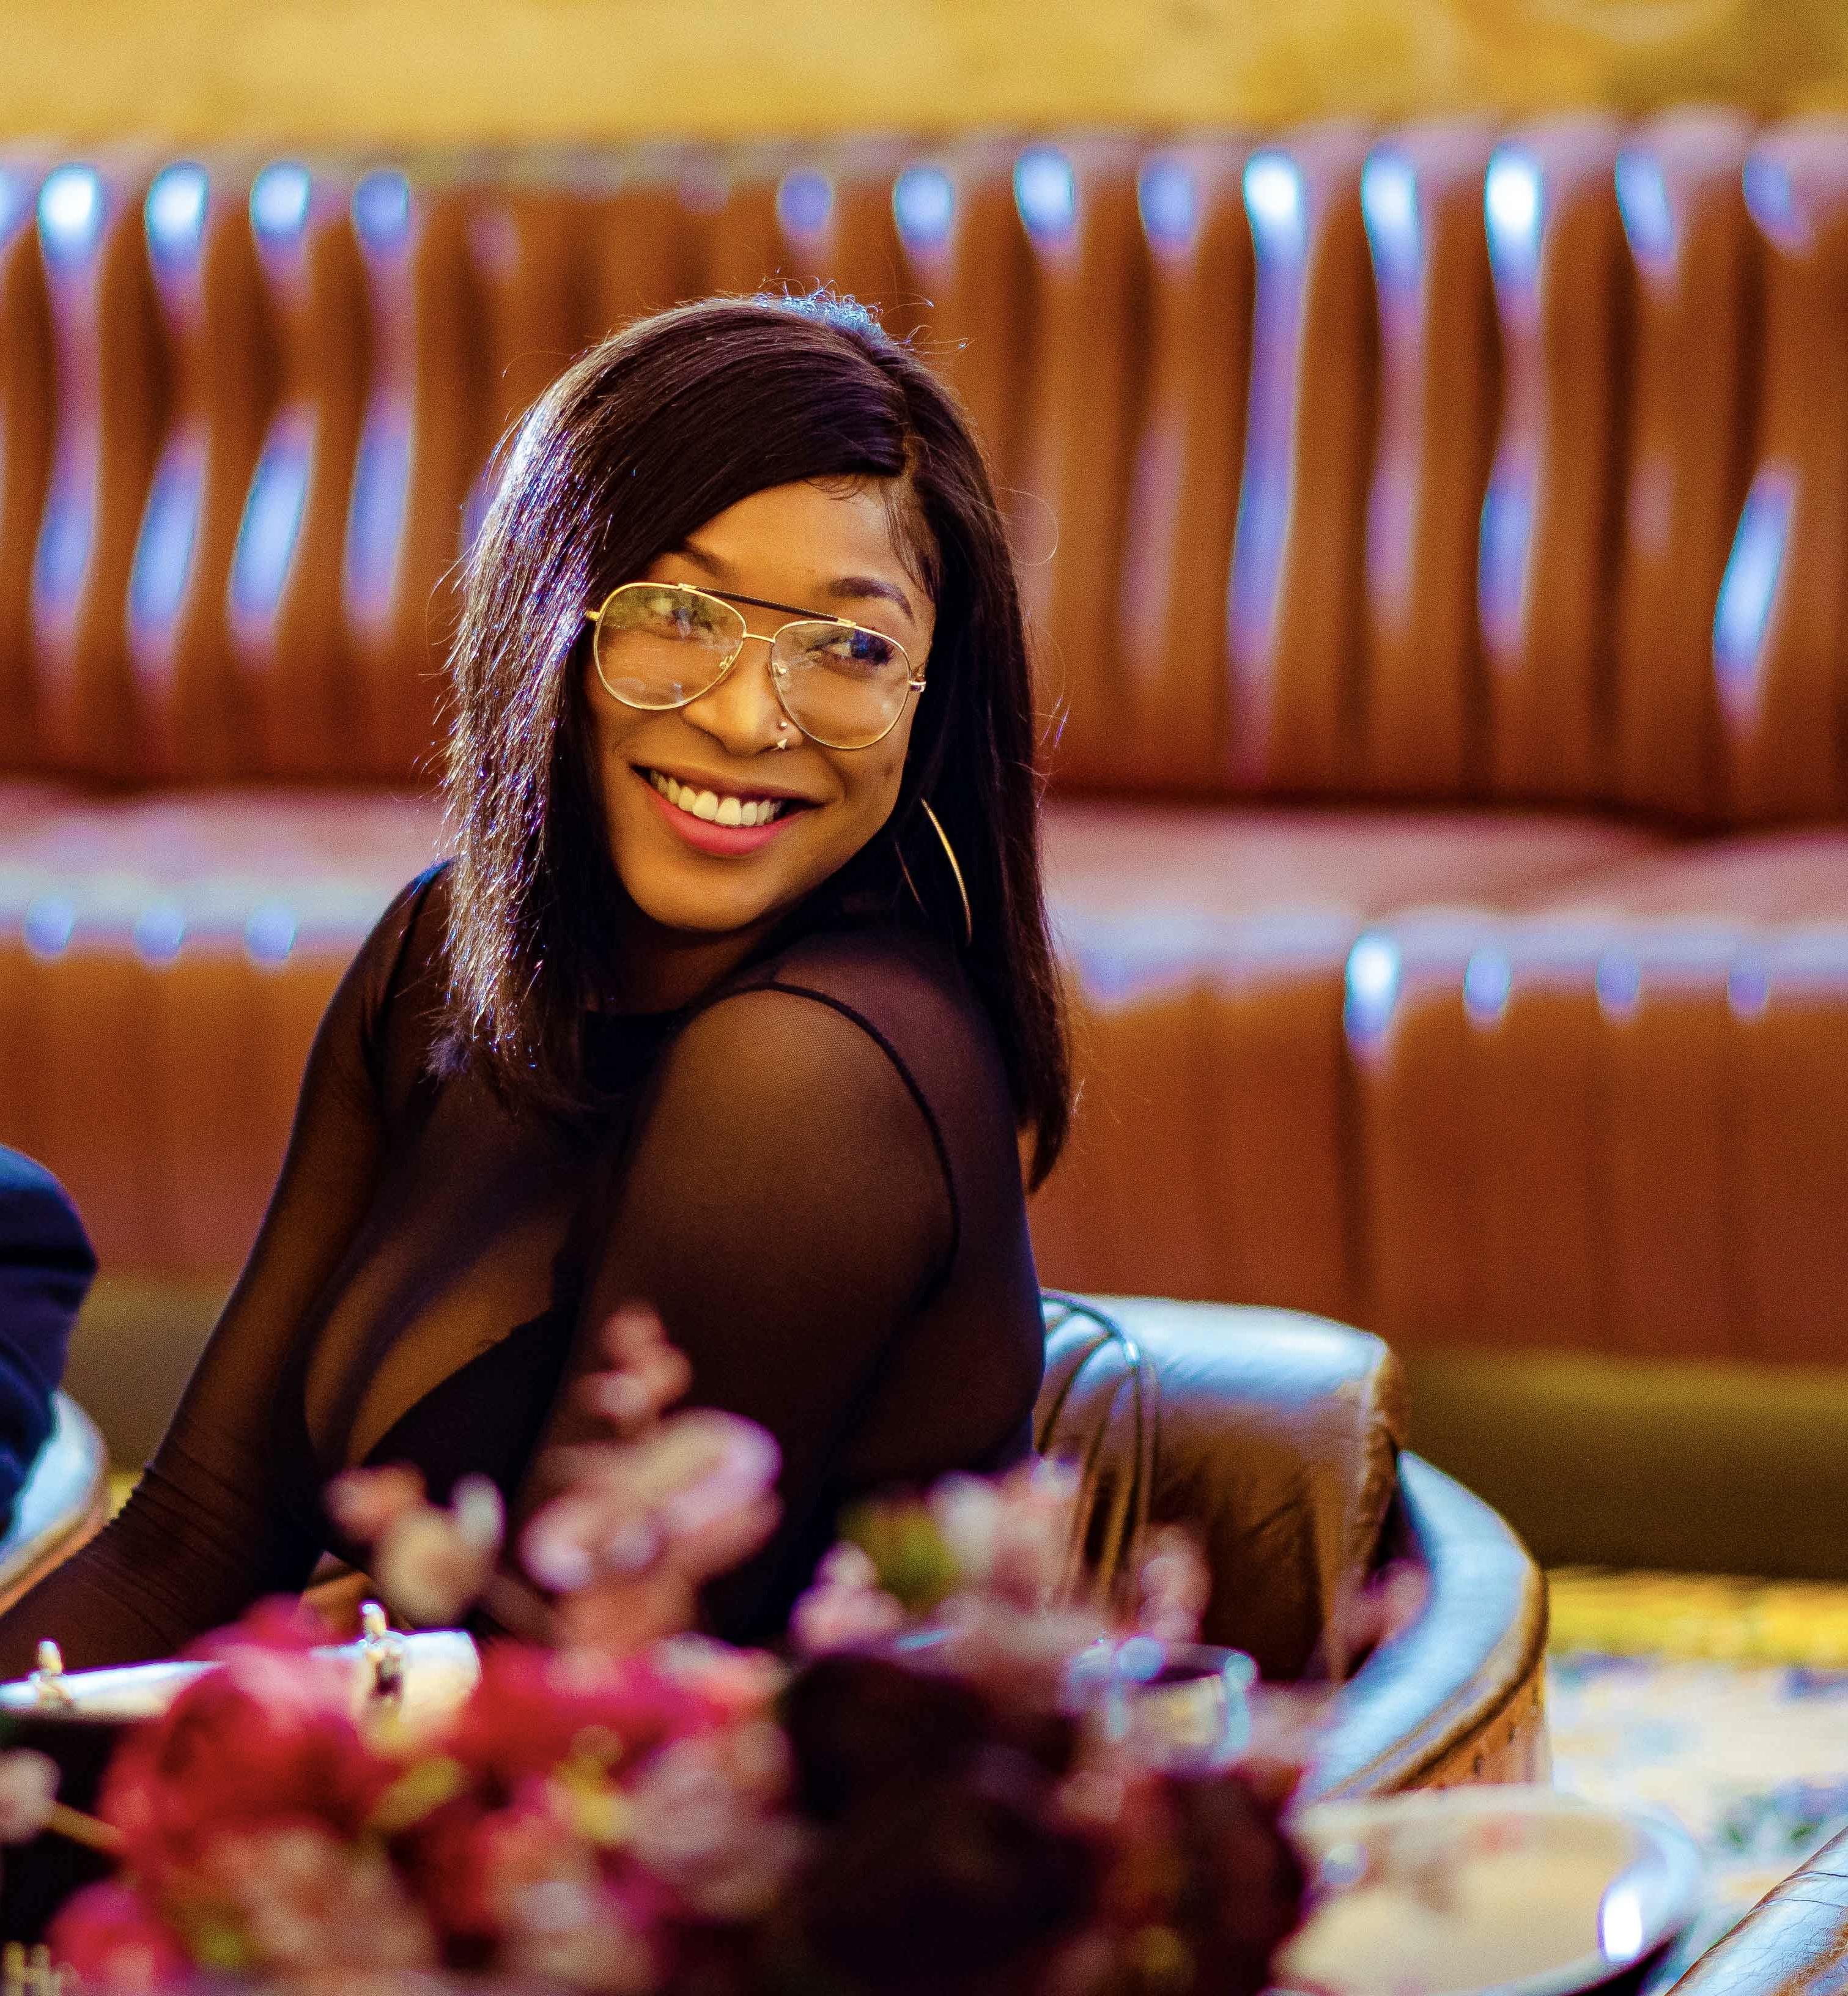 Adenike Isi Adeeko to Host Omah Lay at Abuja's biggest summer party.